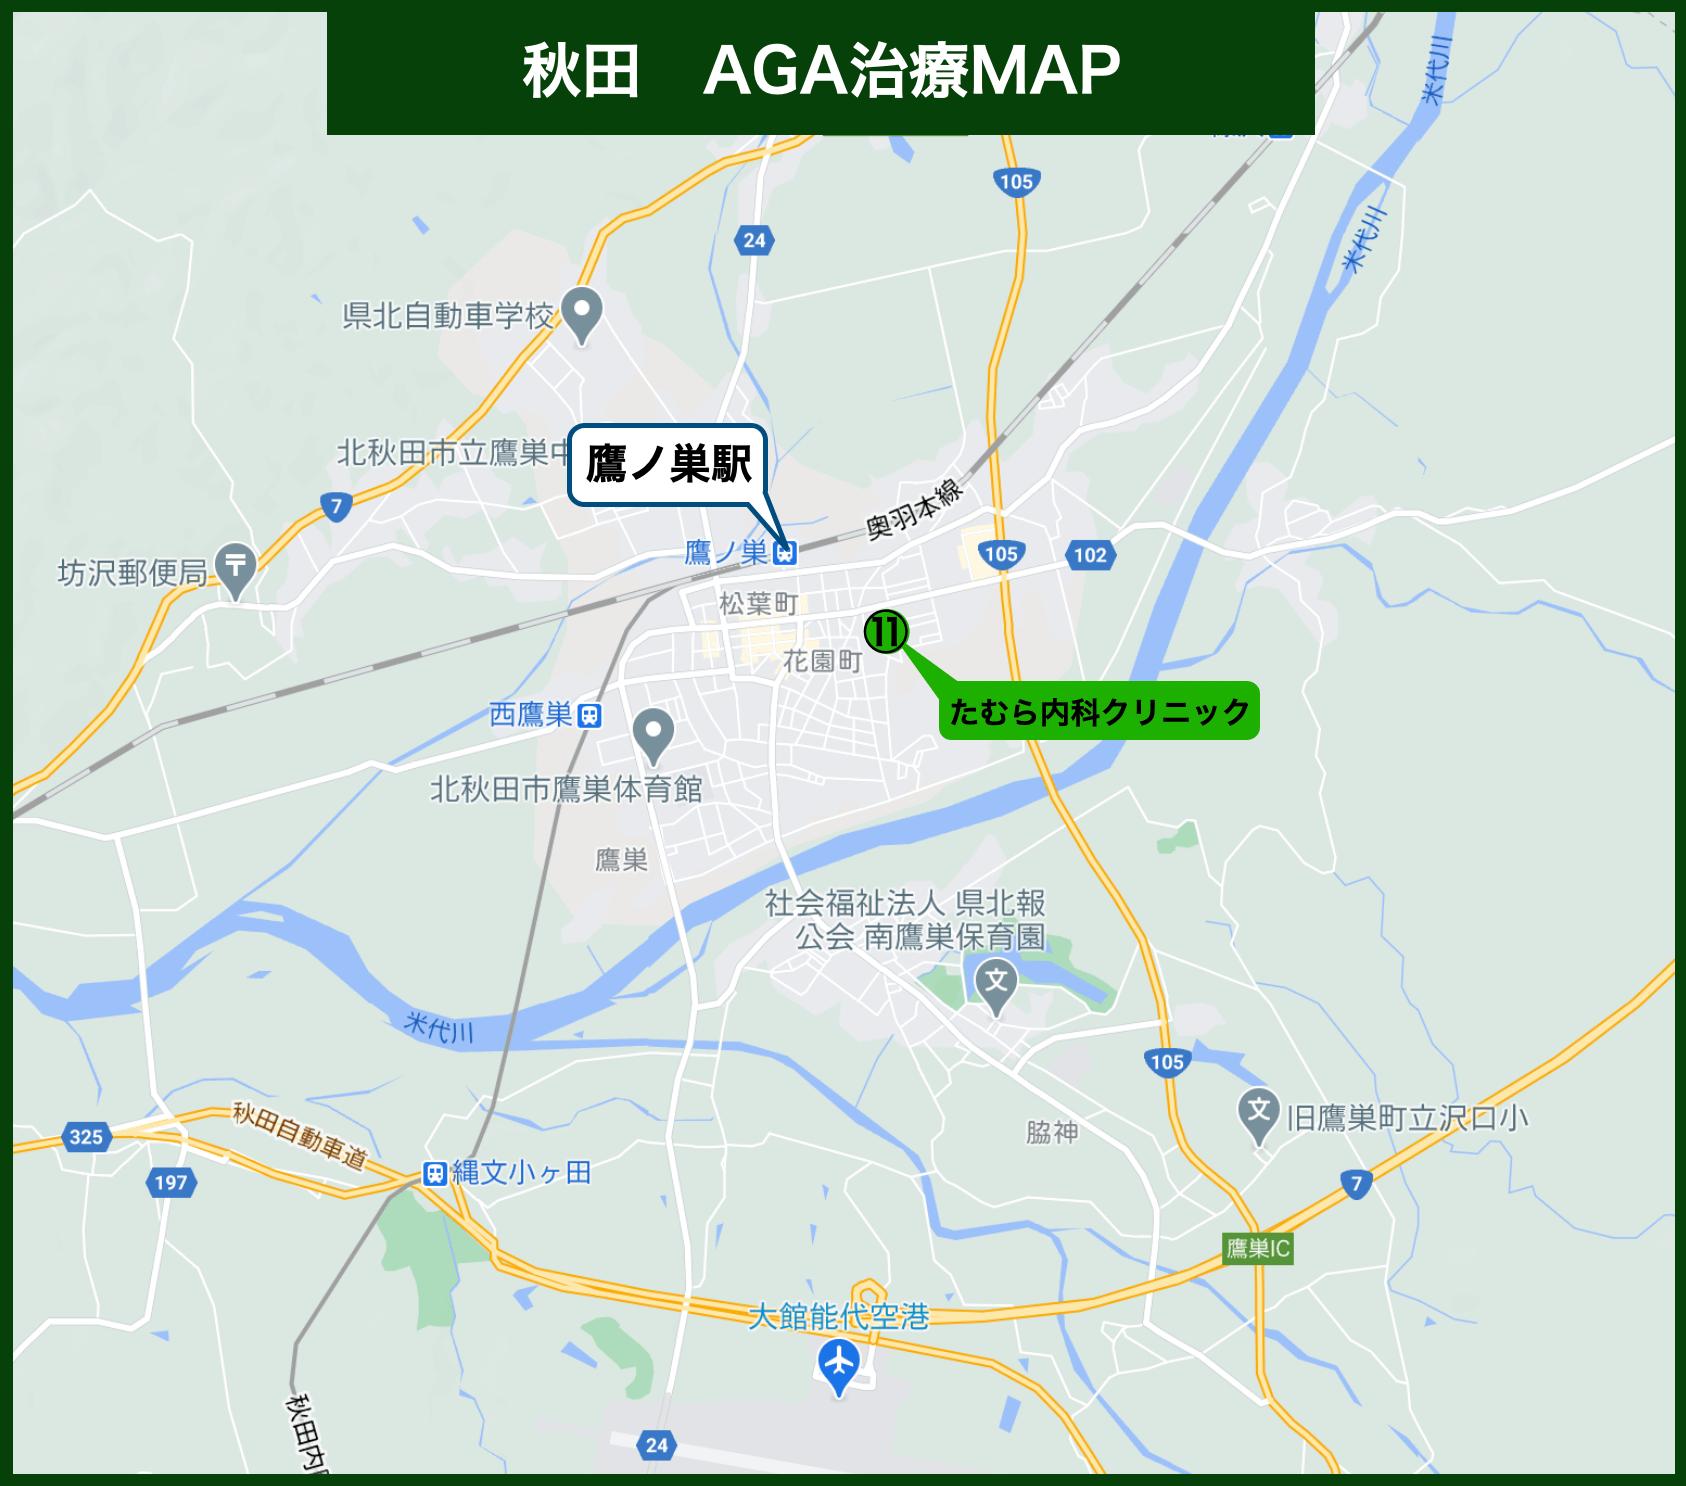 秋田AGA治療MAP